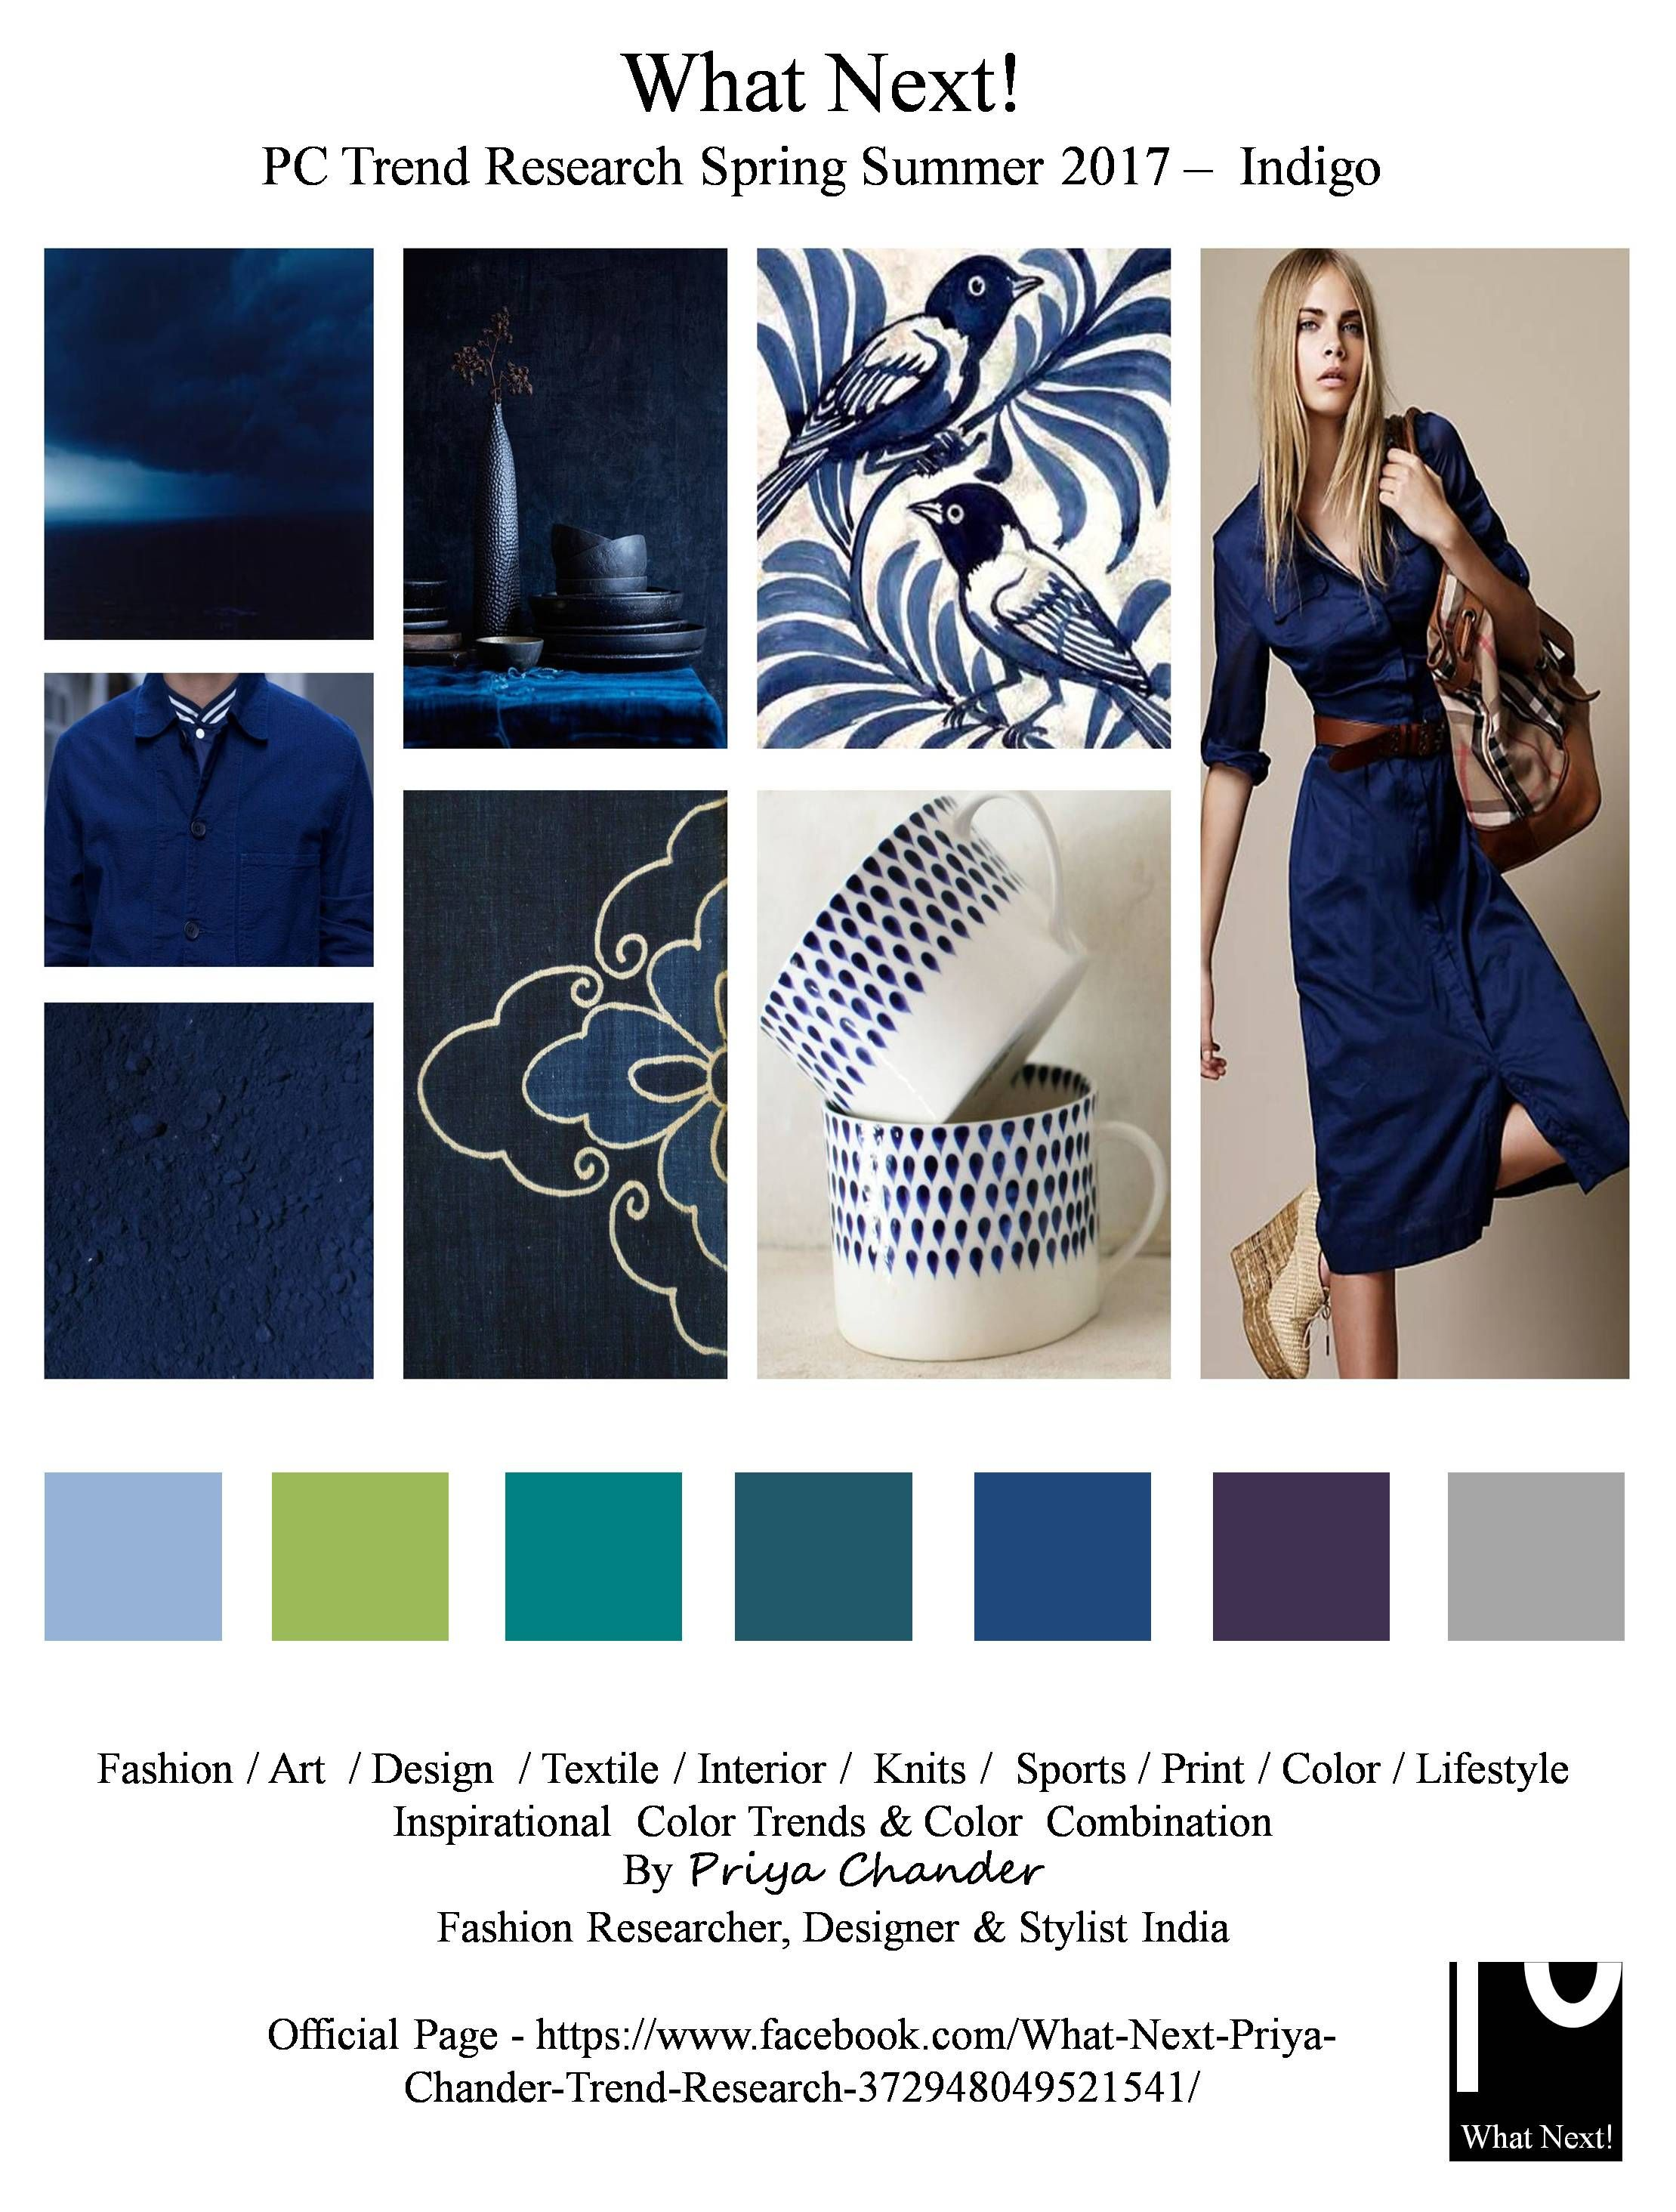 #fashion #indigo #SS17 #indigoblue #denim #blue #colortrends #Caradelevingne #fashionresearch #fashiontrends #dapper #menswear #Burberry #fineart #homedecor #interiordesign #fashionnews #fashionblogger